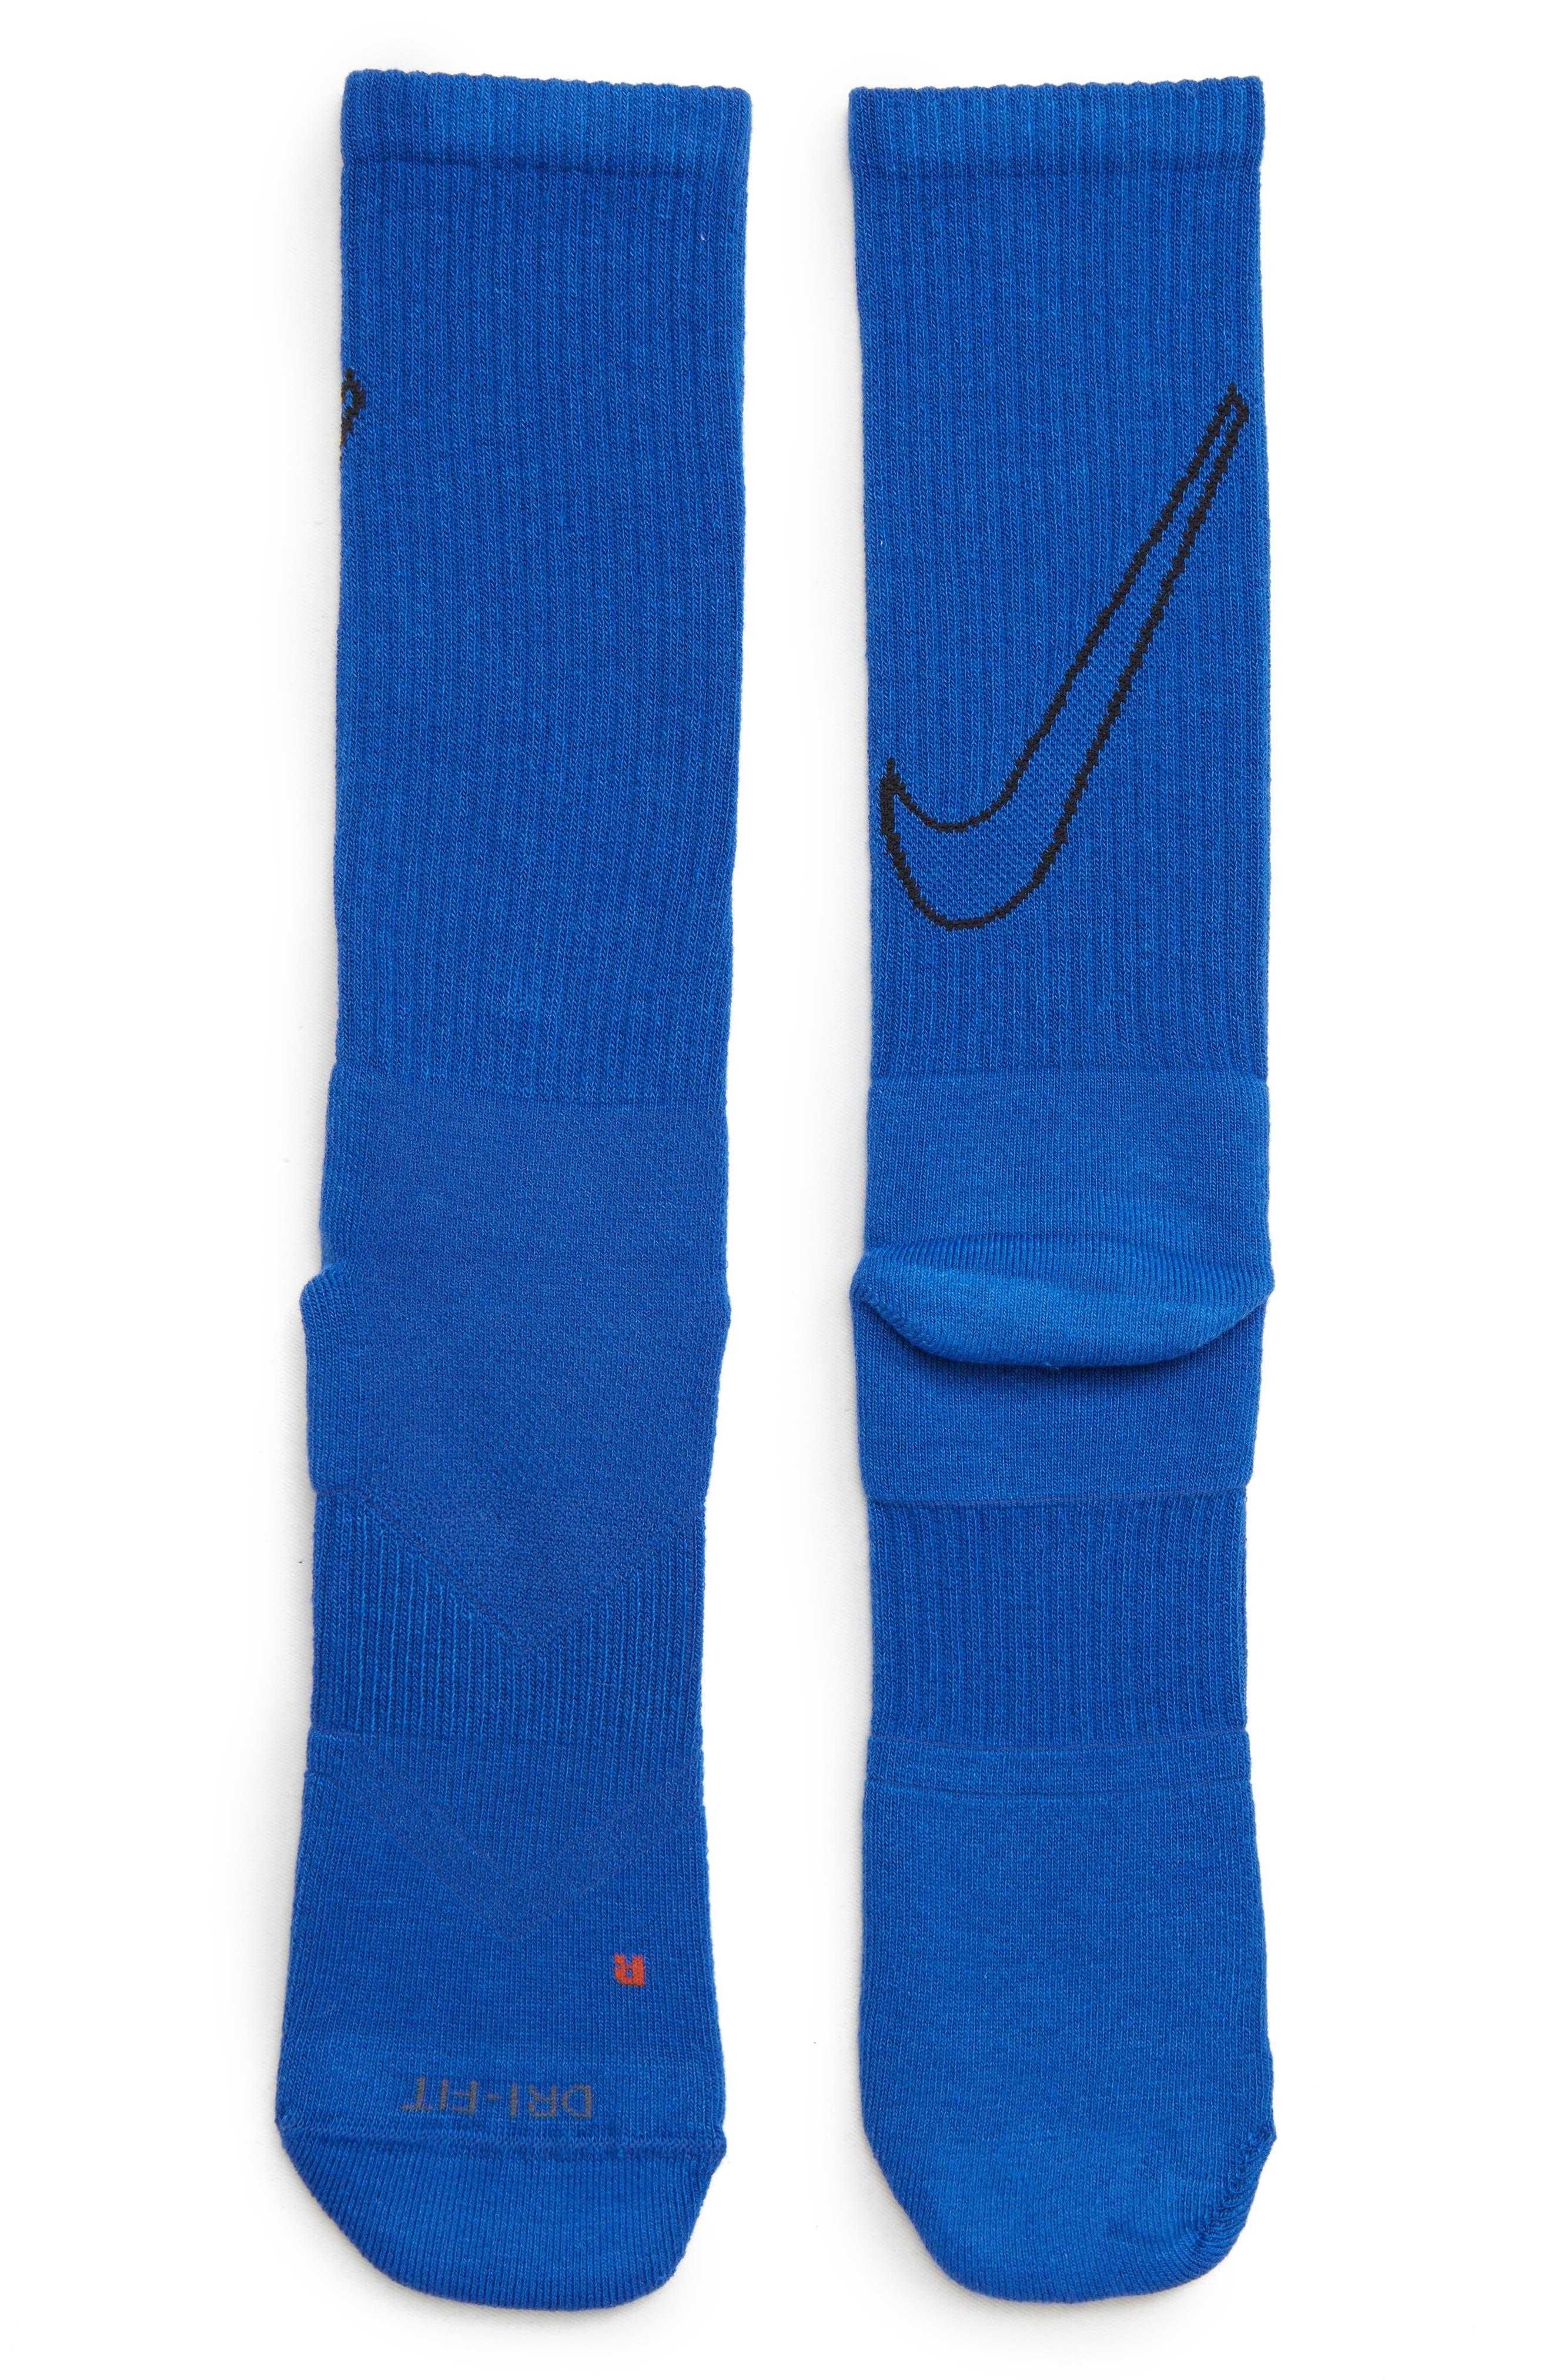 NIKE, Everyday Max Cushion 3-Pack Crew Socks, Alternate thumbnail 2, color, 100